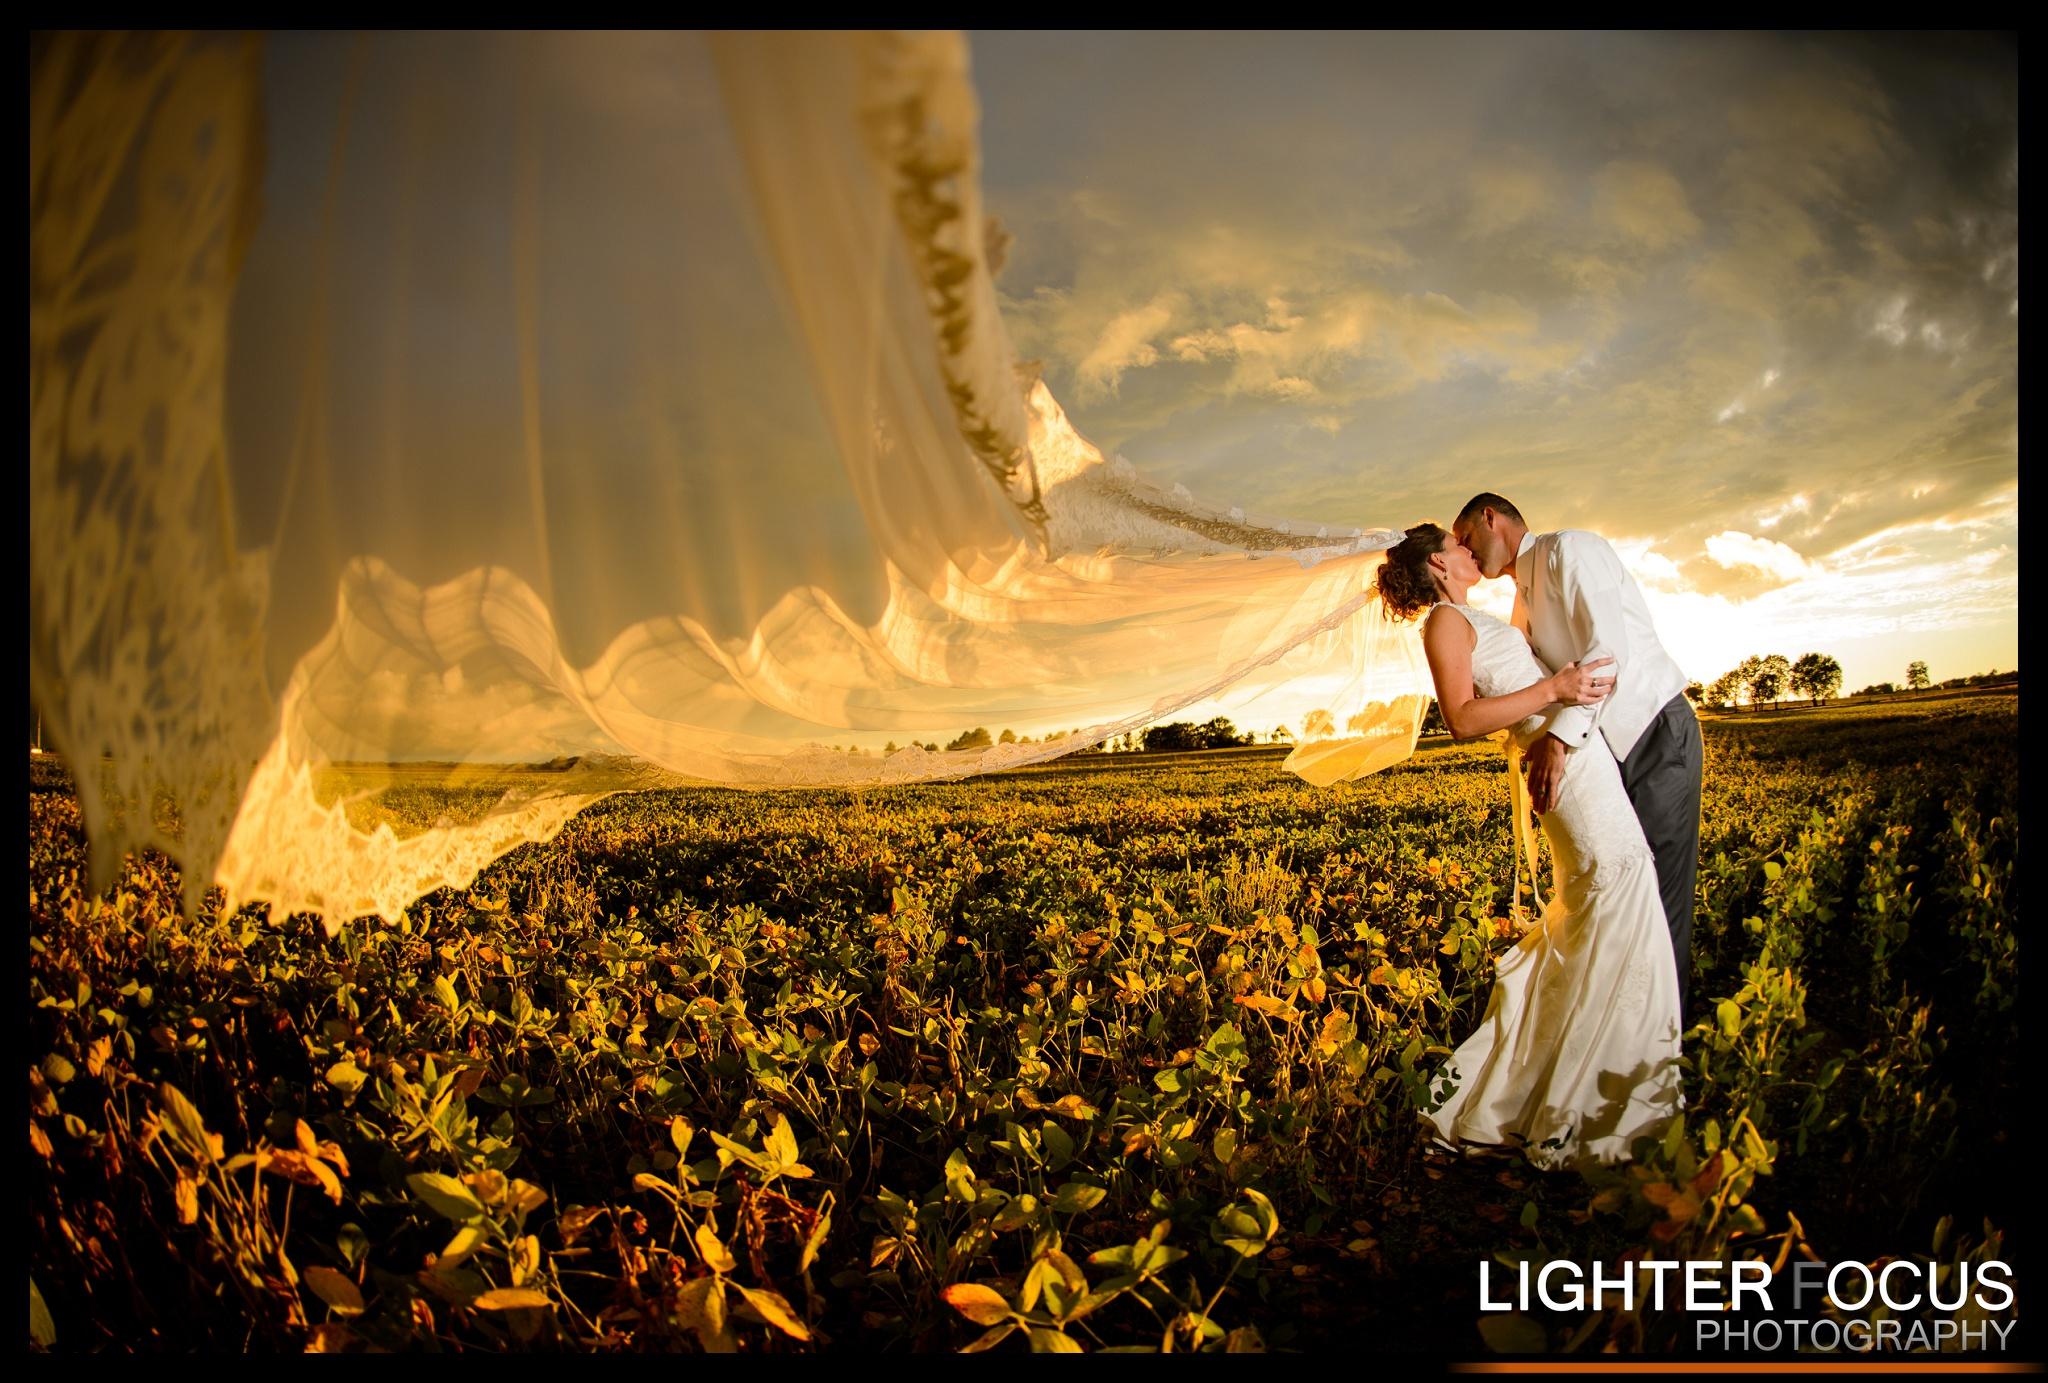 Lake of the Ozarks weddings